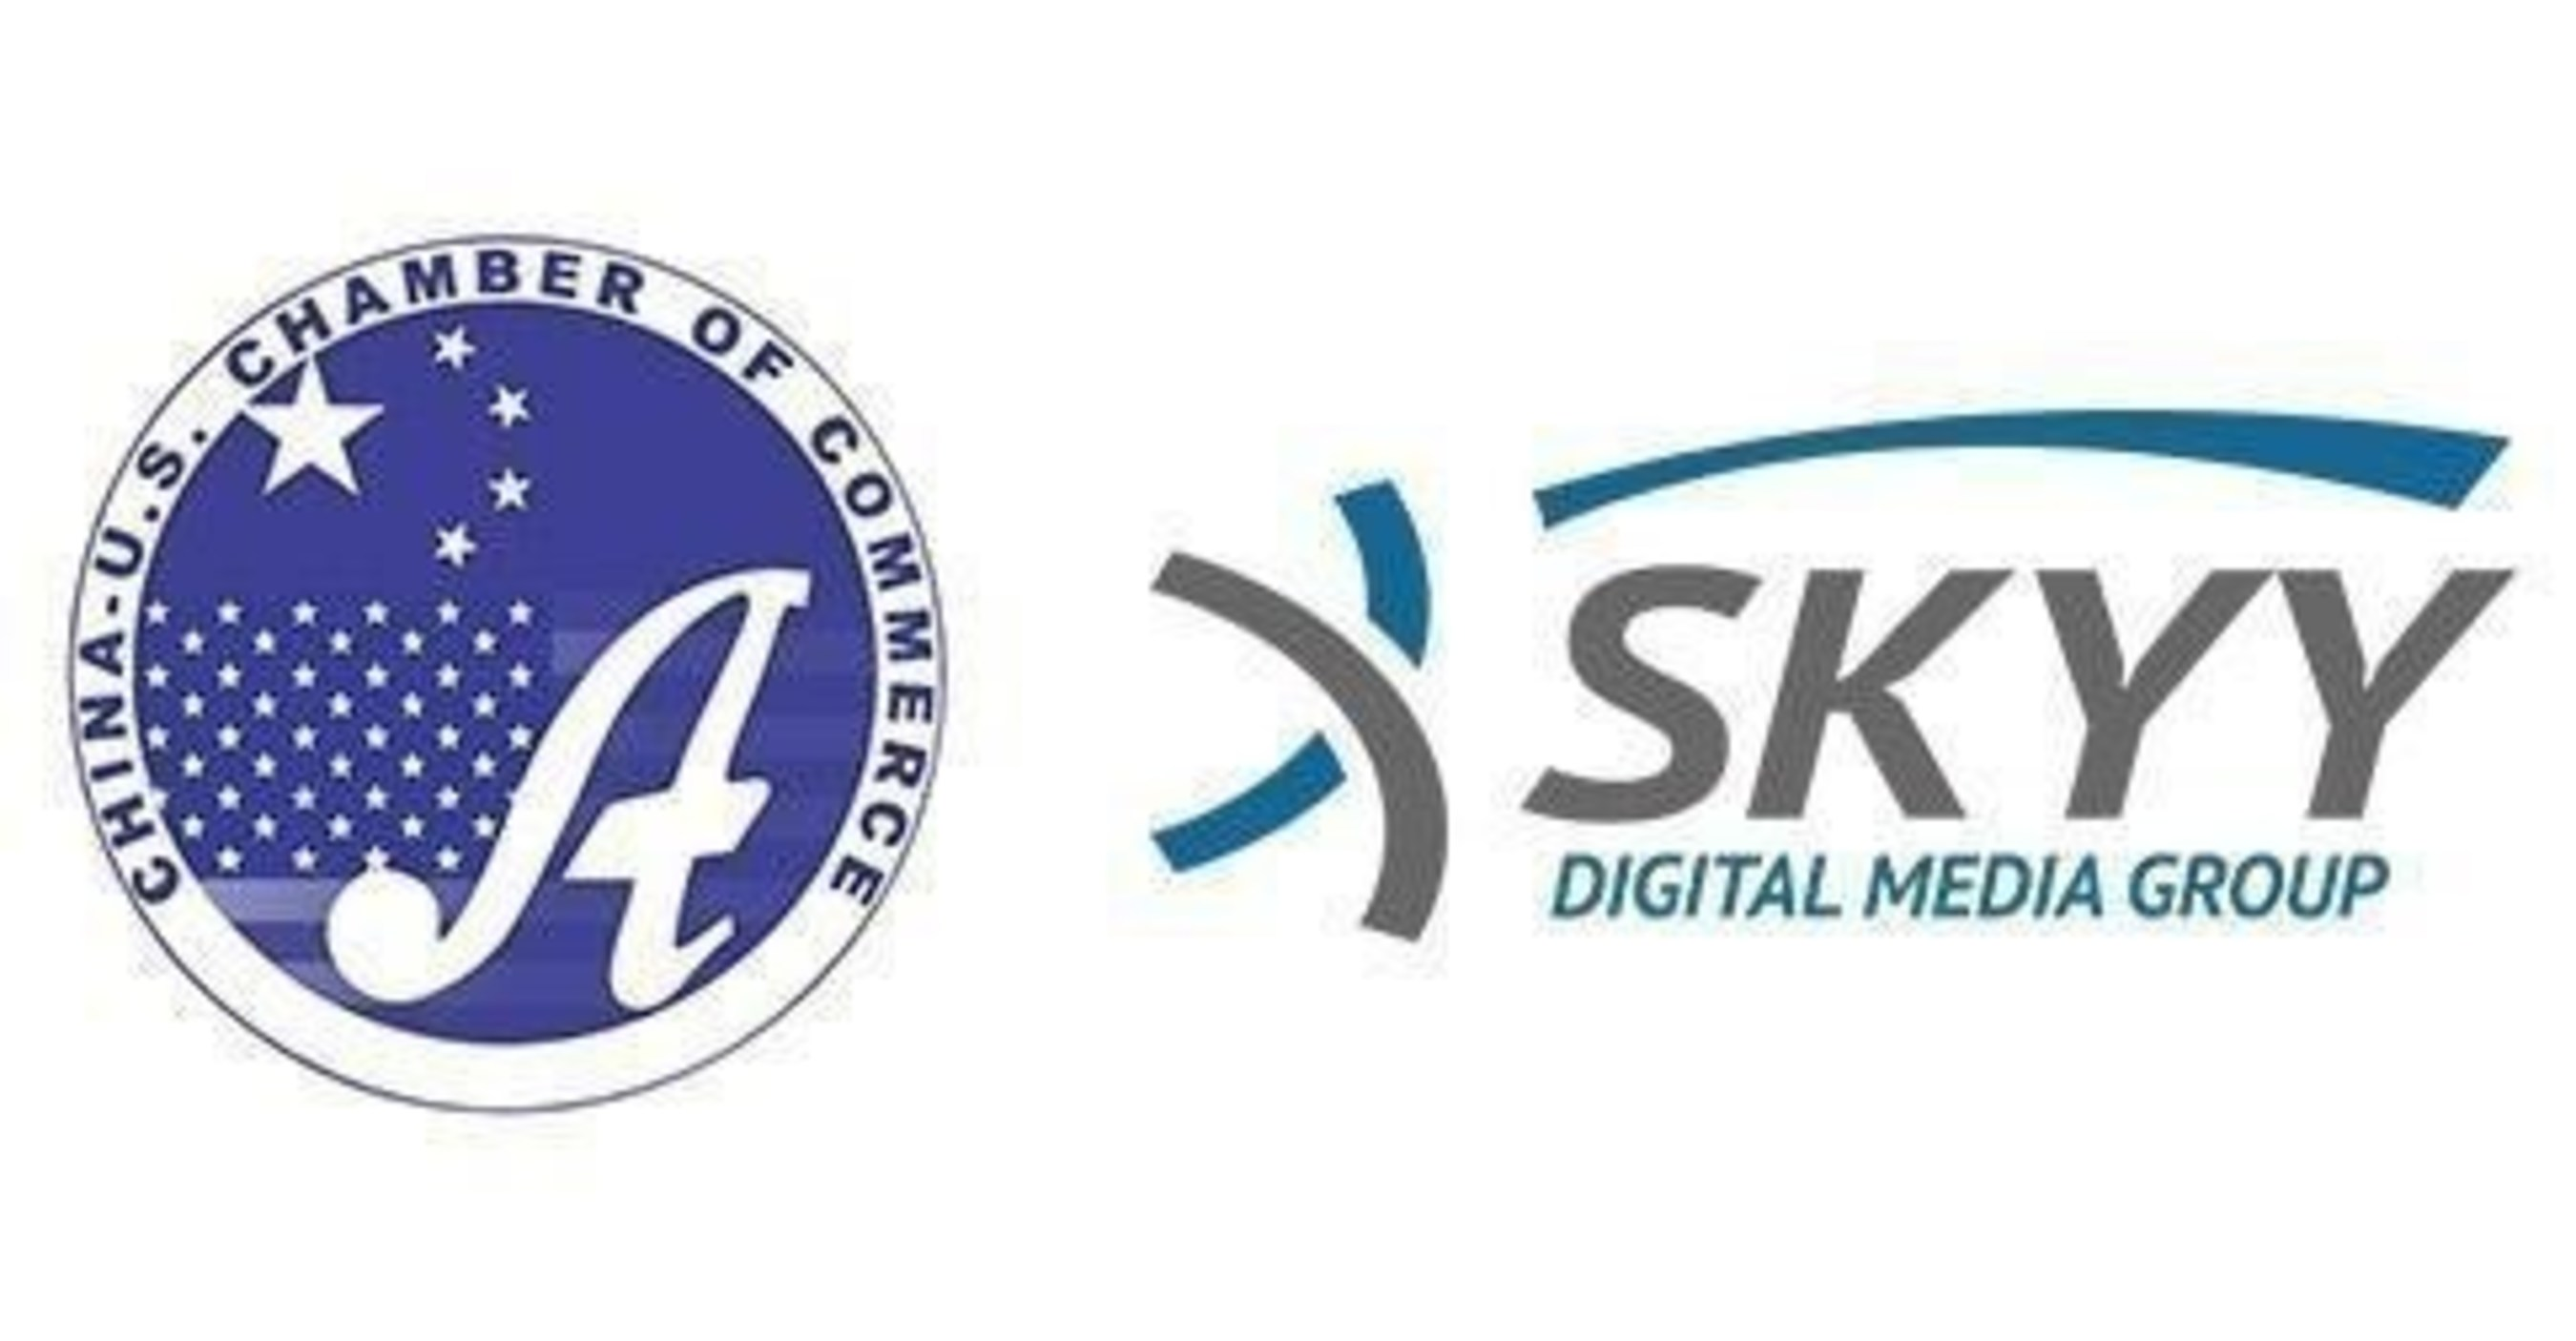 SKYY Digital Media Group Named Most Innovative Company at China-US ...